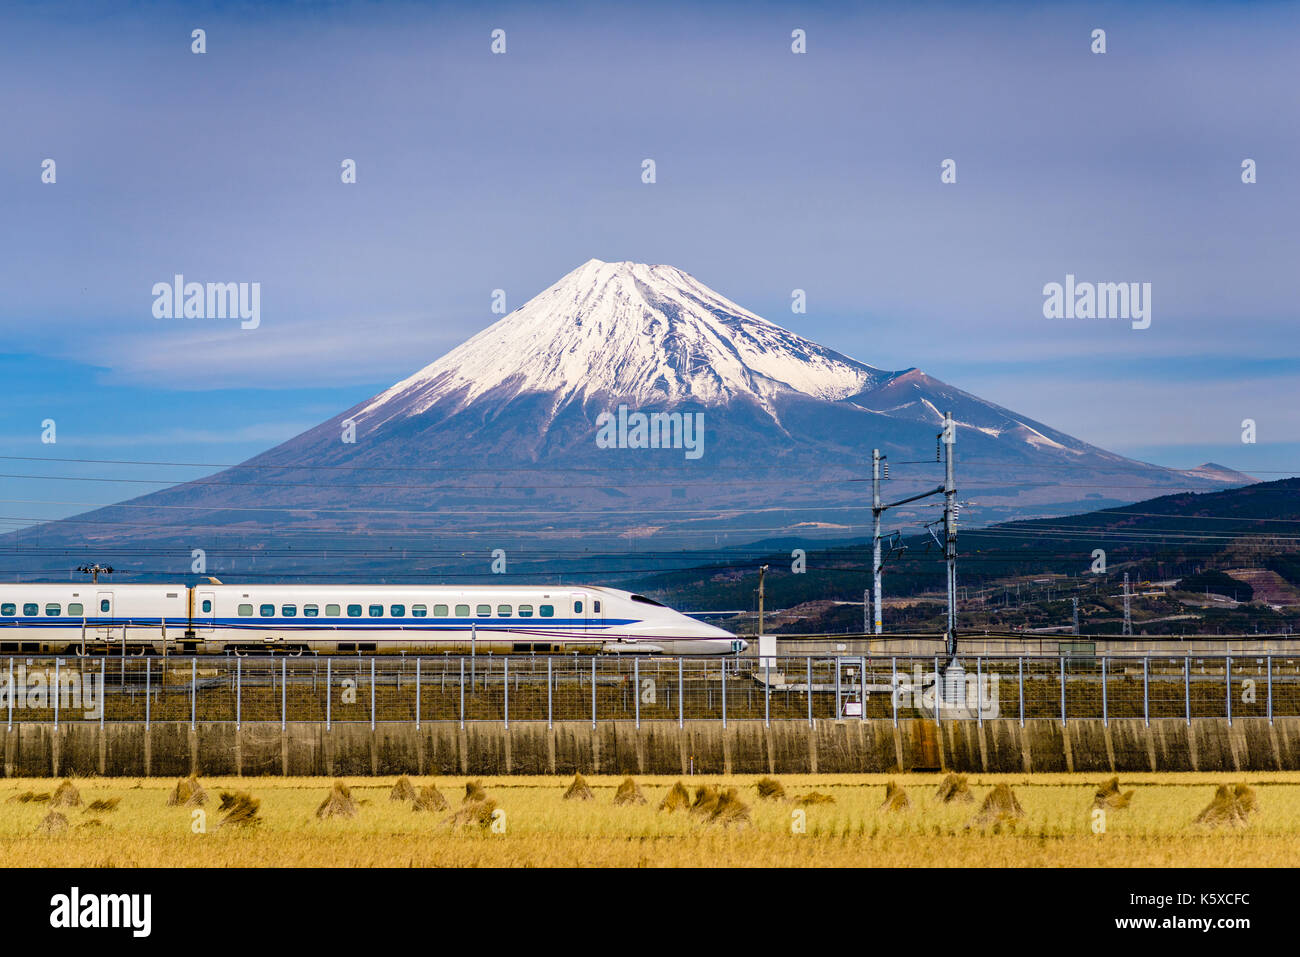 Mt. Fuji and train in Japan. Stock Photo